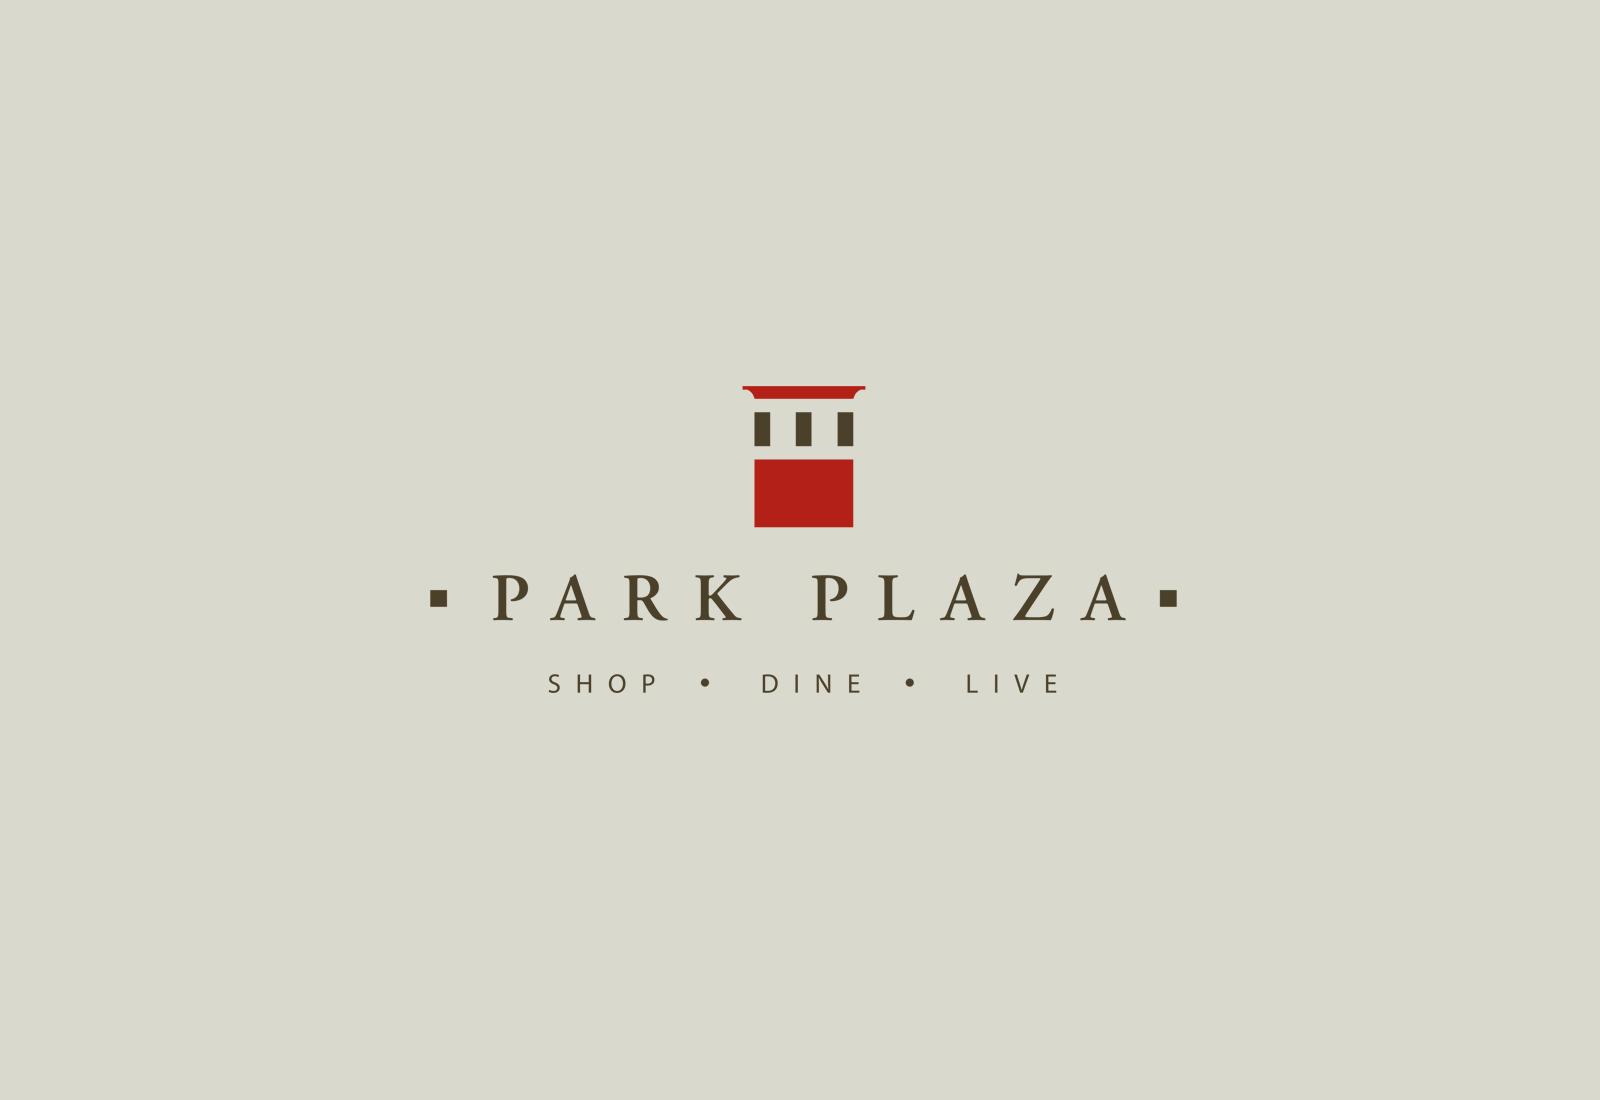 Park Plaza Edwardsville Logo View 2